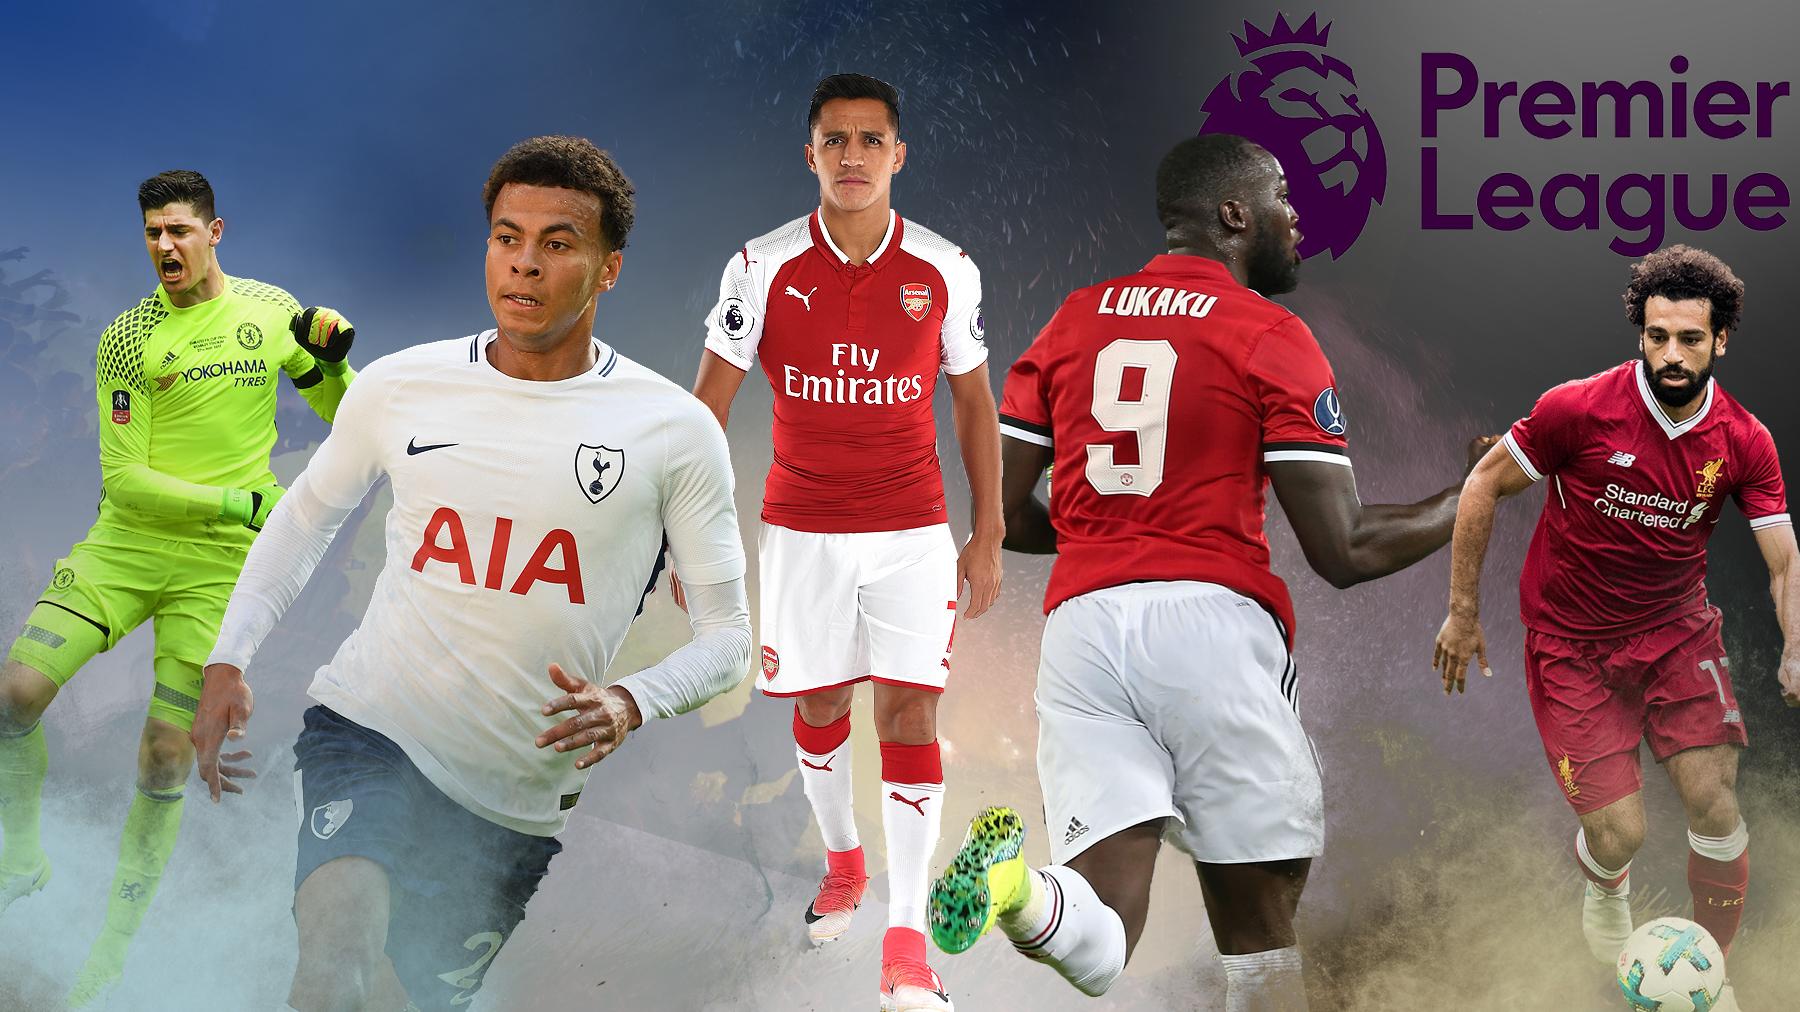 Romelu Lukaku and Thibaut Courtois among the five players who can shape the 2017/18 Premier League season